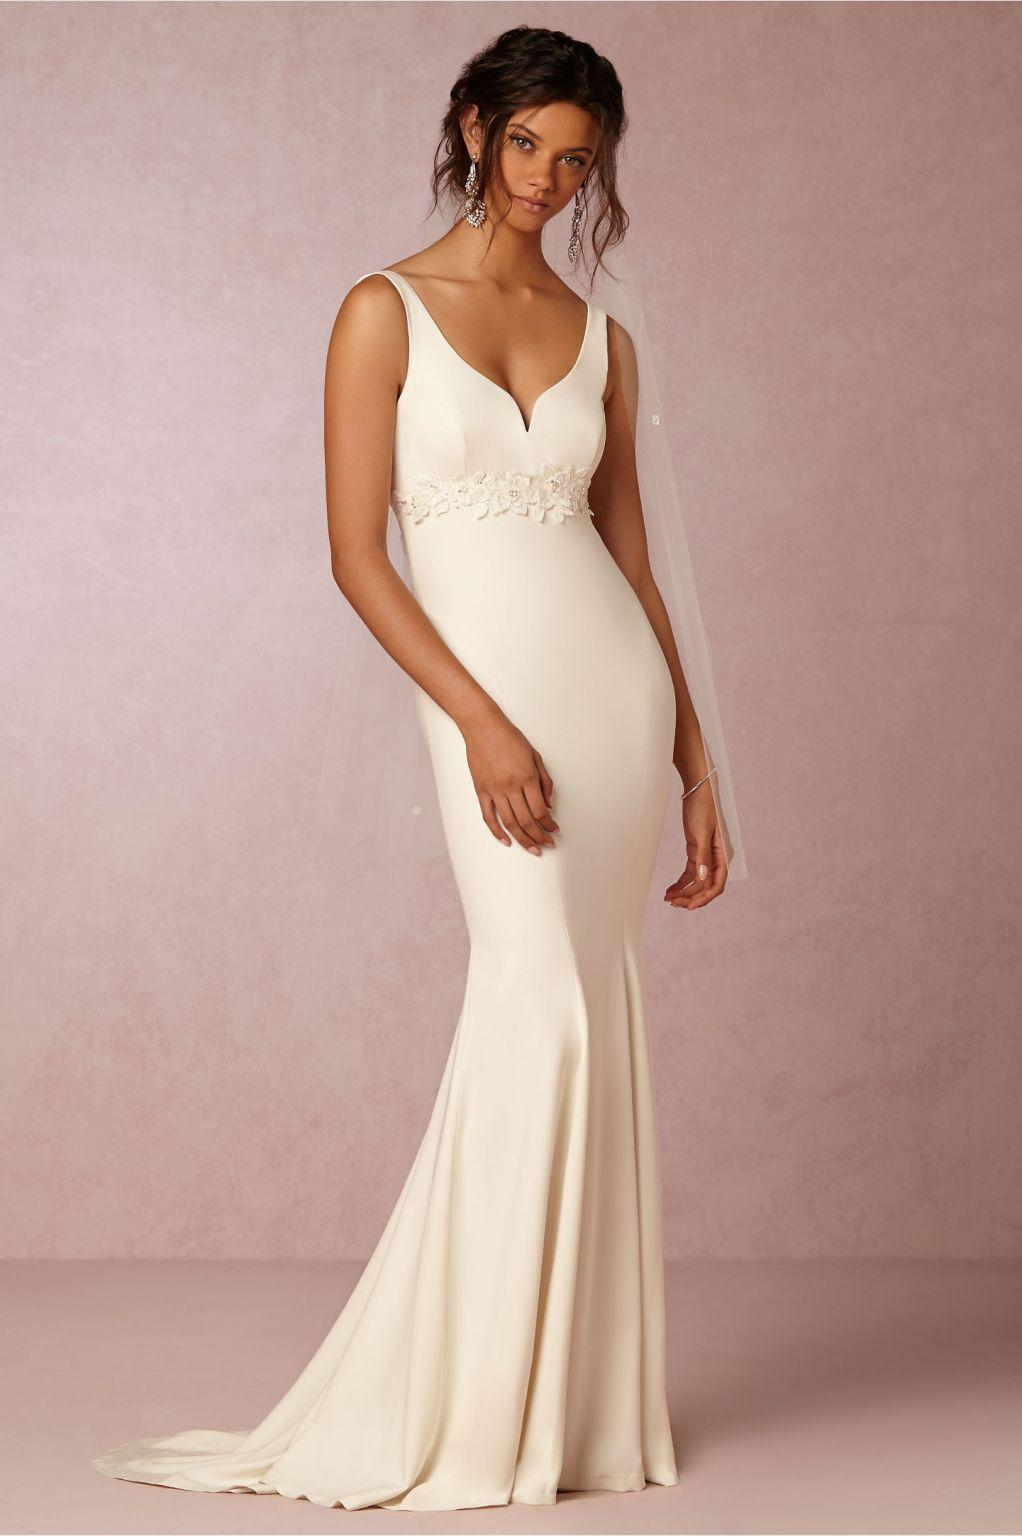 Nicole miller abigail wedding dress new size 8 900